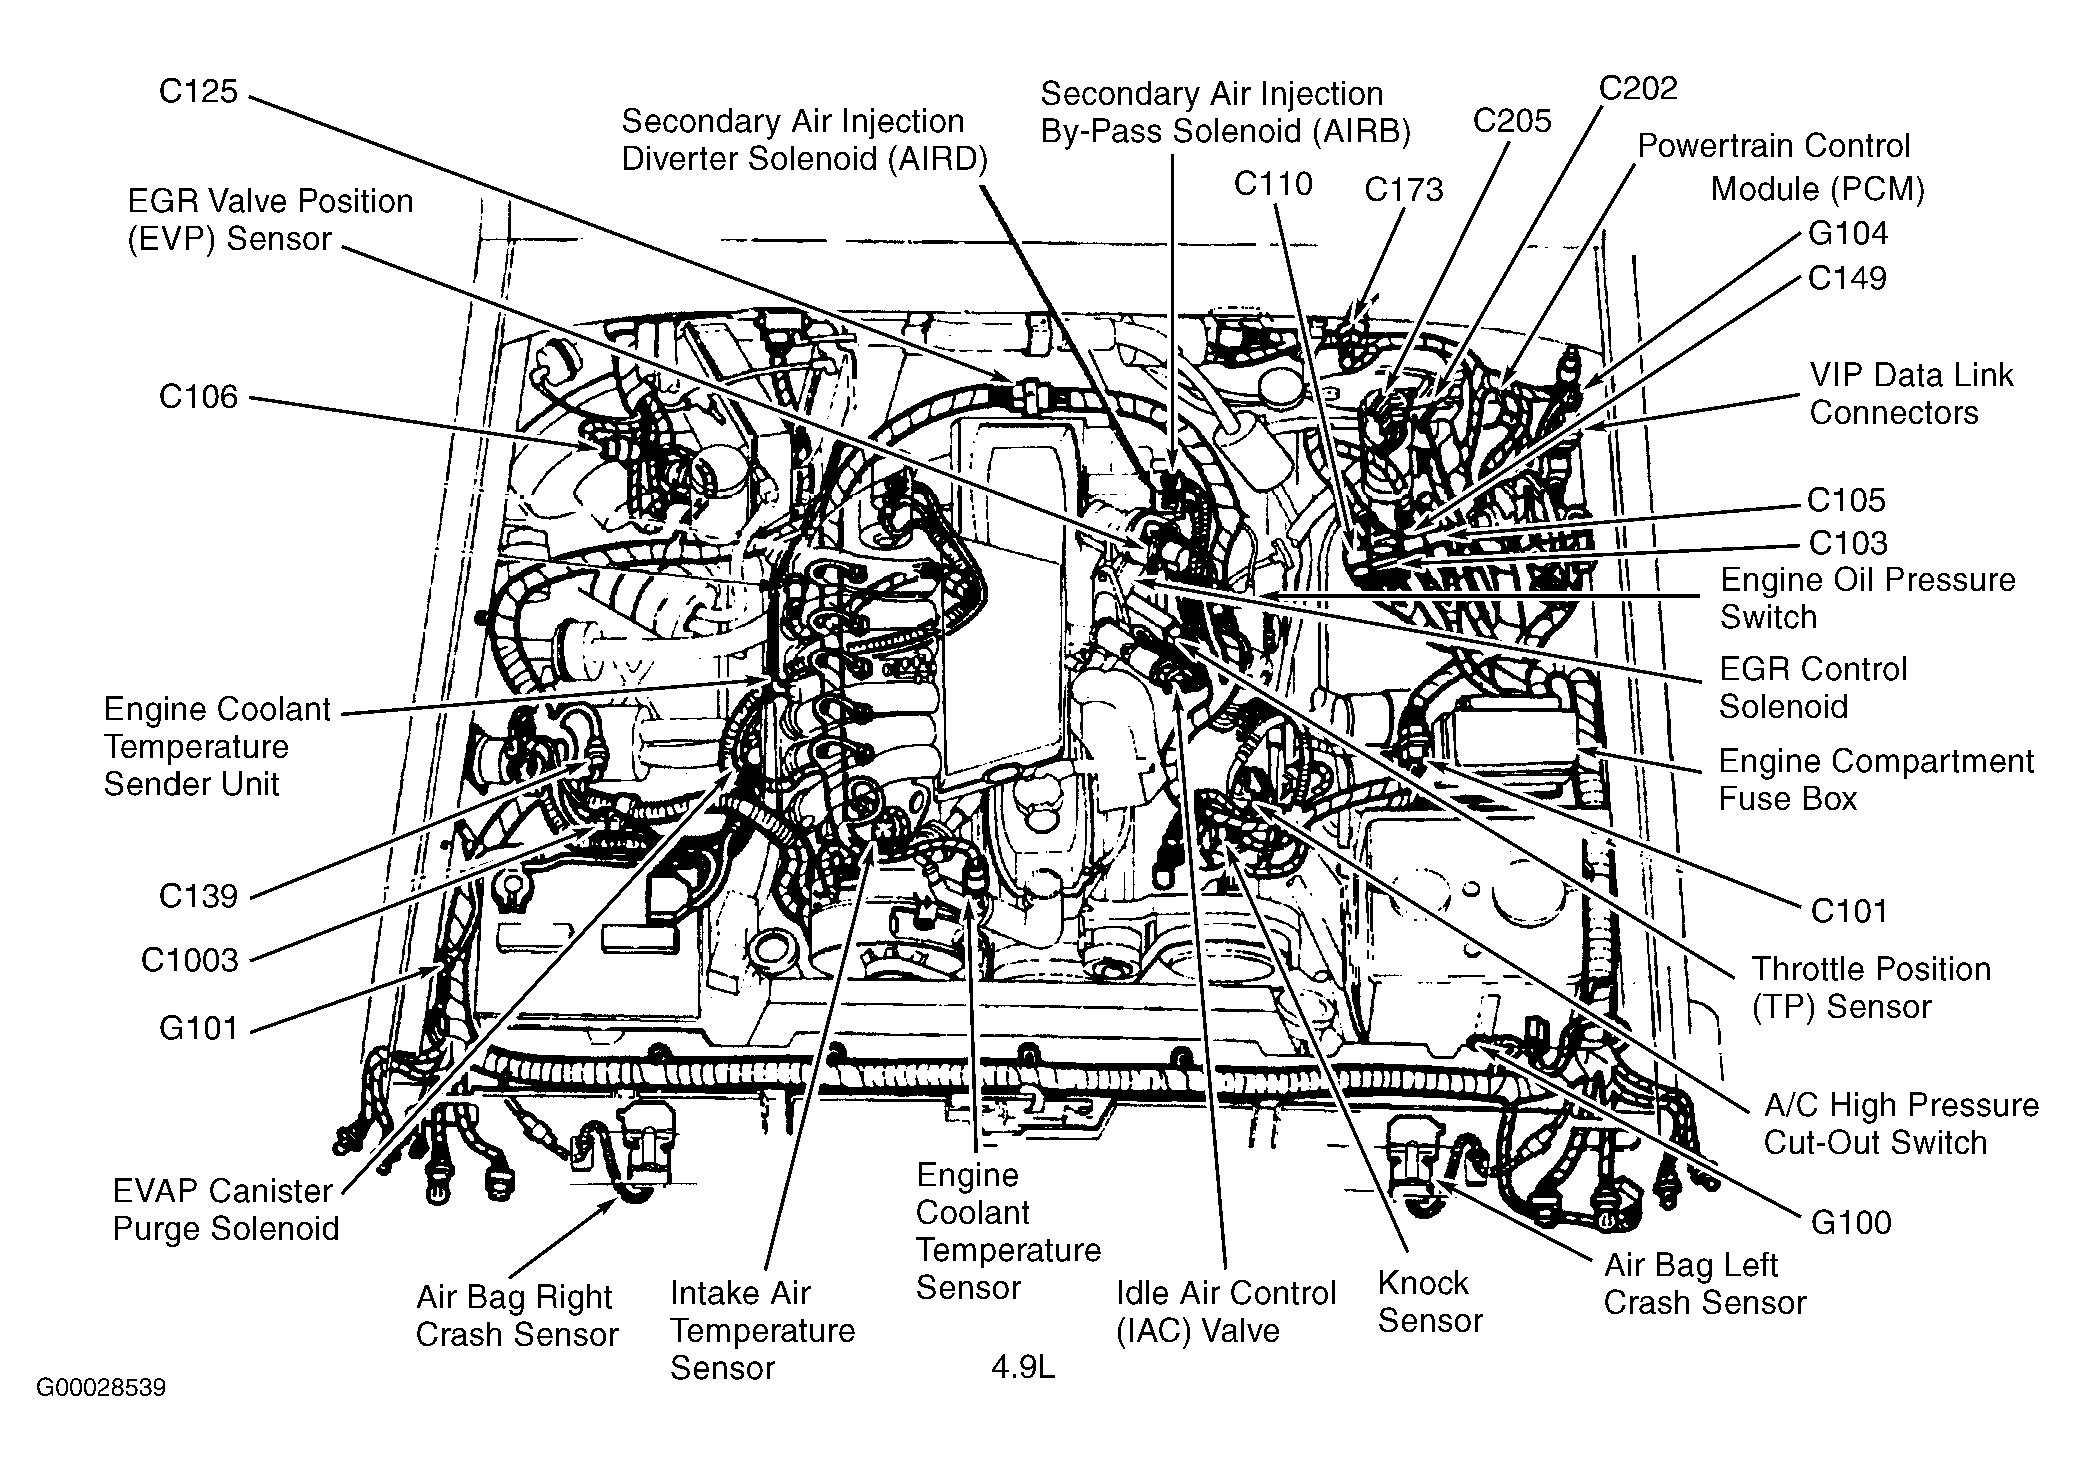 2002 Chevy Cavalier Engine Diagram 96 Chevy S10 Engine Diagrams Of 2002 Chevy Cavalier Engine Diagram